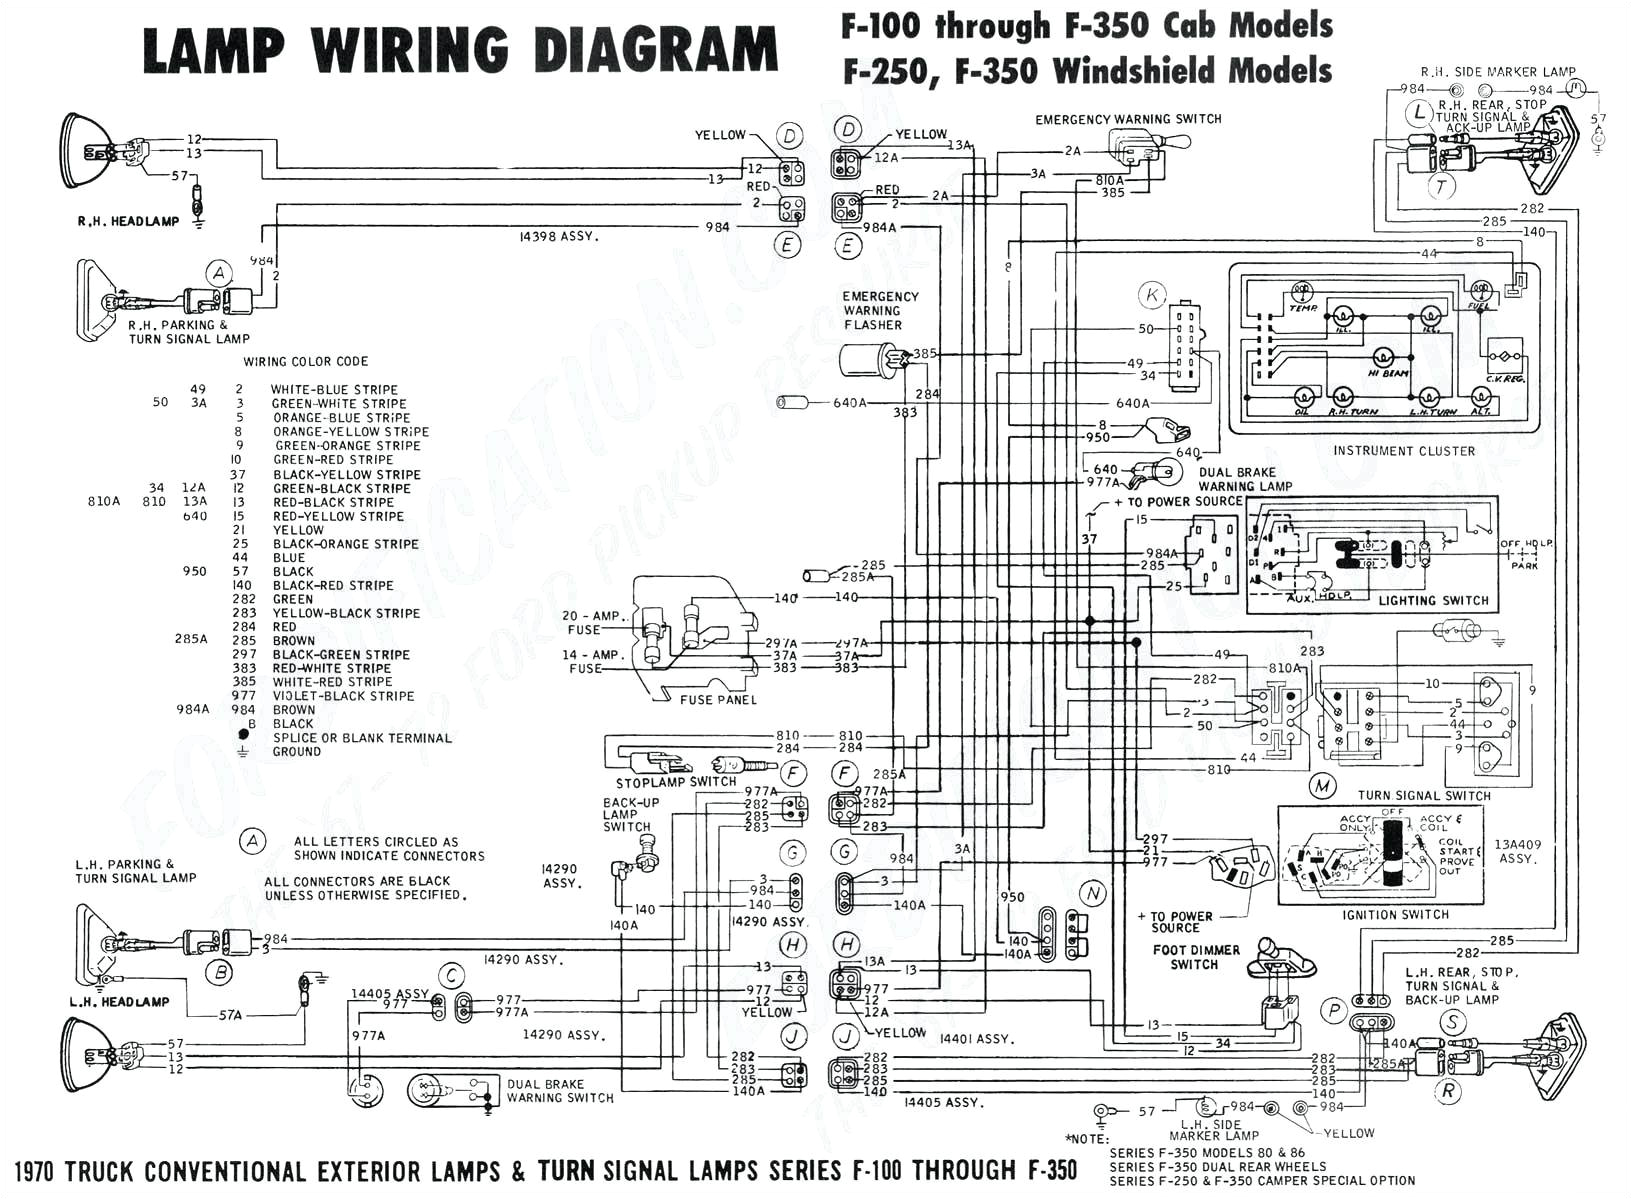 5 pin wiring diagram new diagram wiring rocker switch with 5 pins jpg